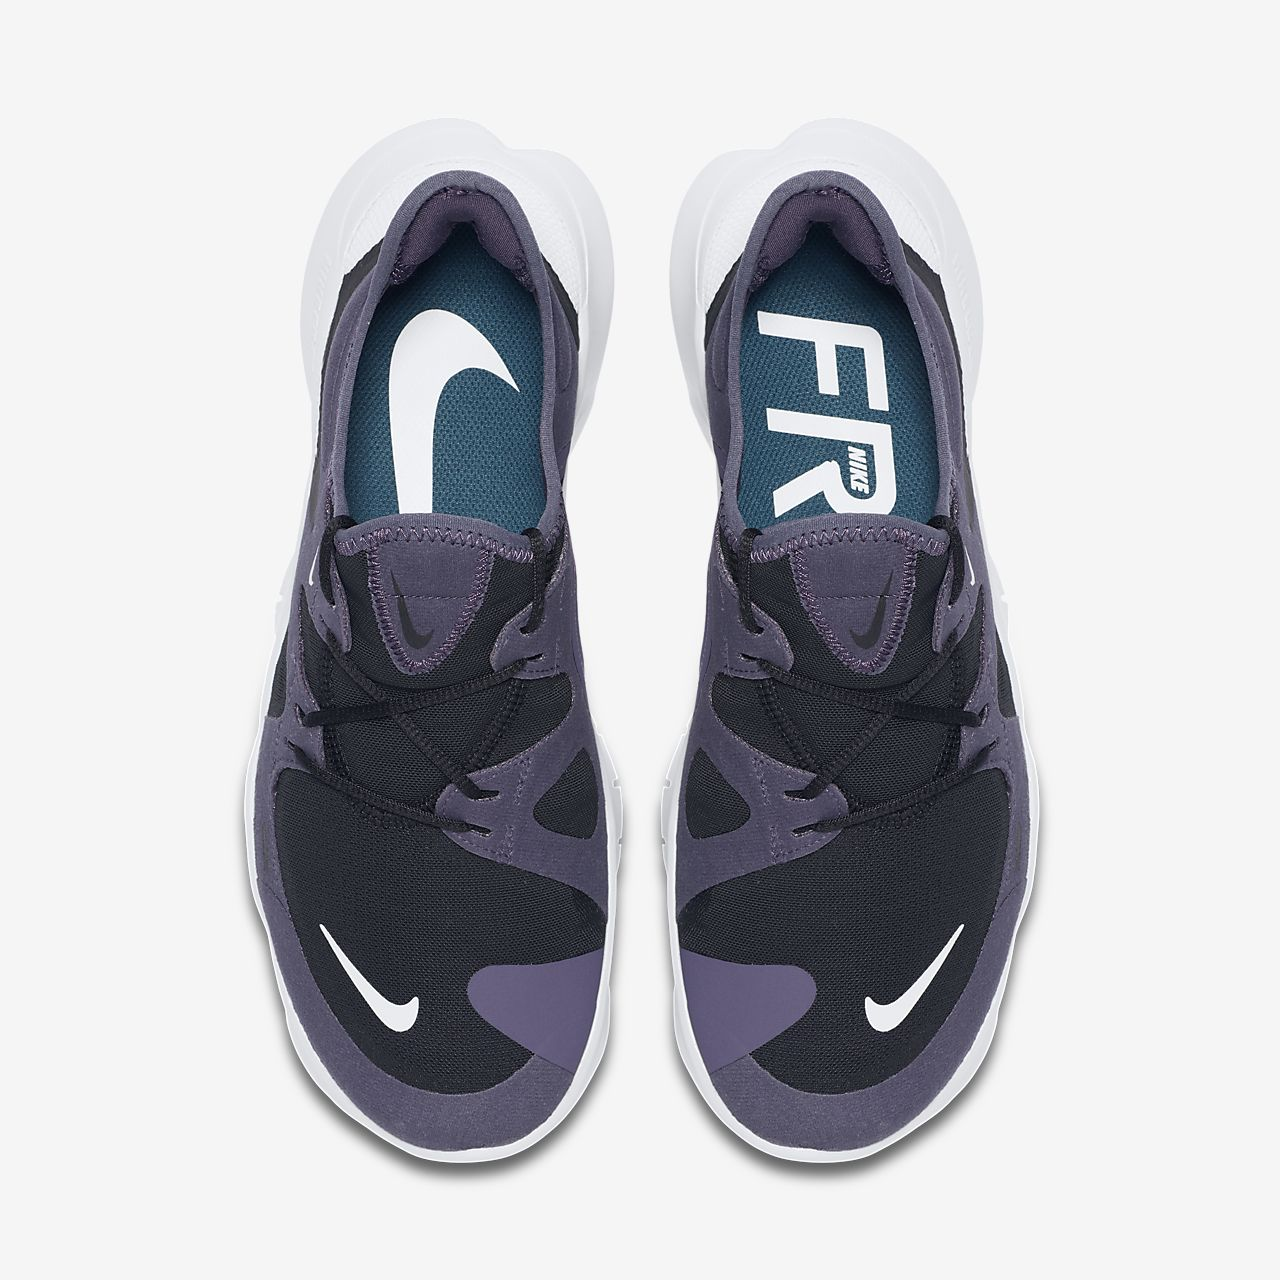 50% 80% discount on sale Nike Sneakers NIKE AIR MAX ZERO